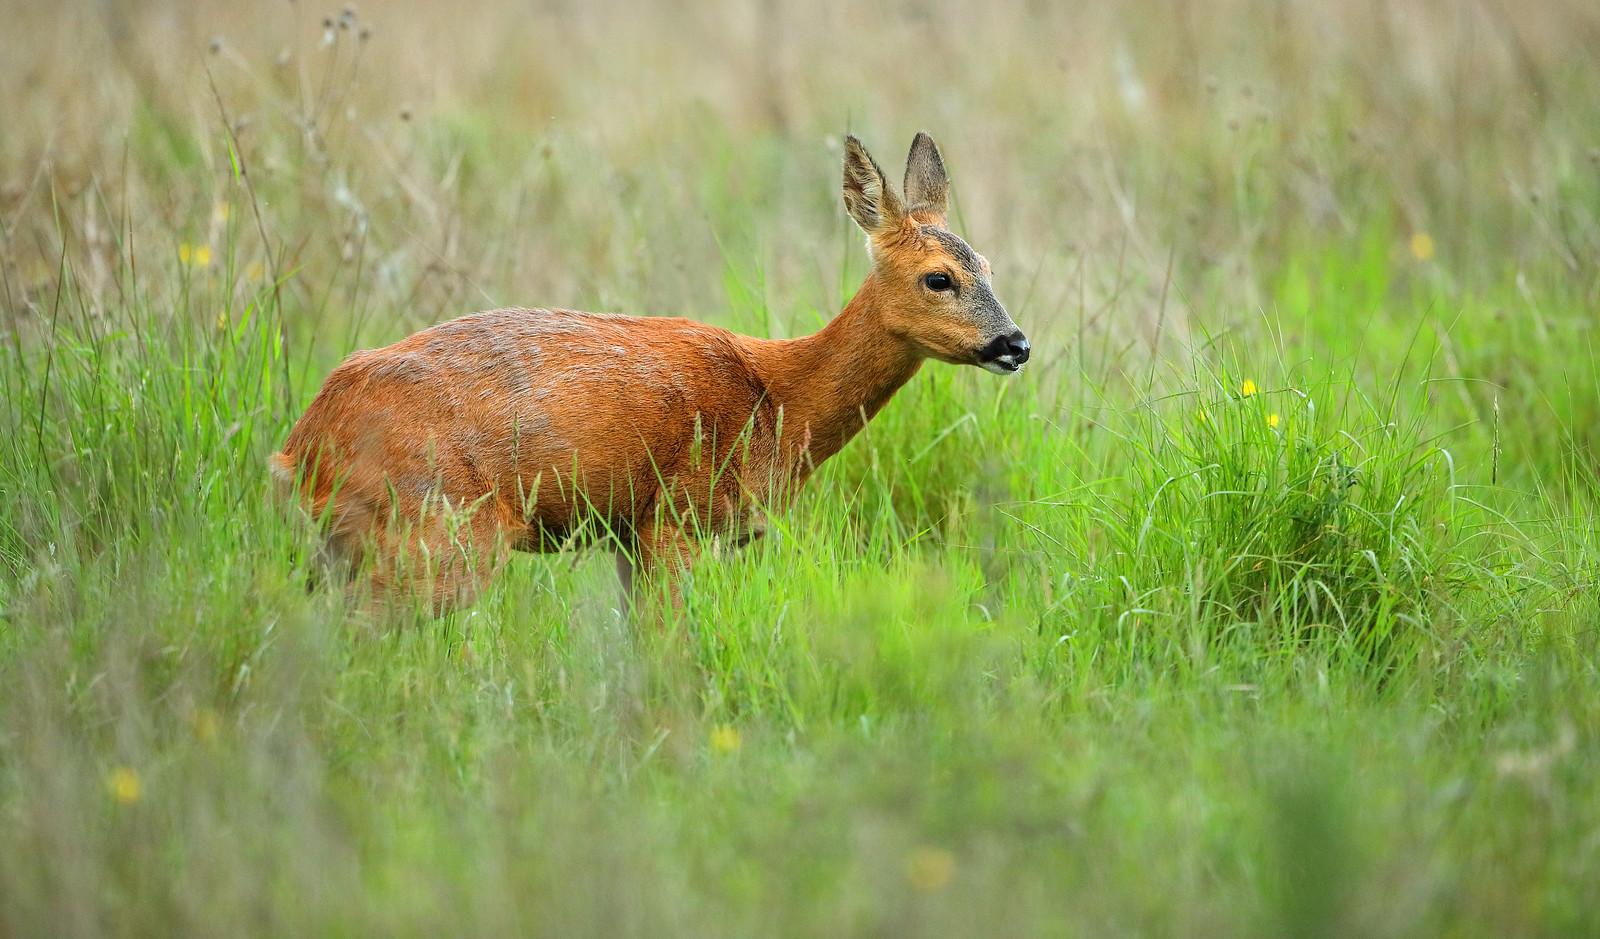 Pregant Roe Deer